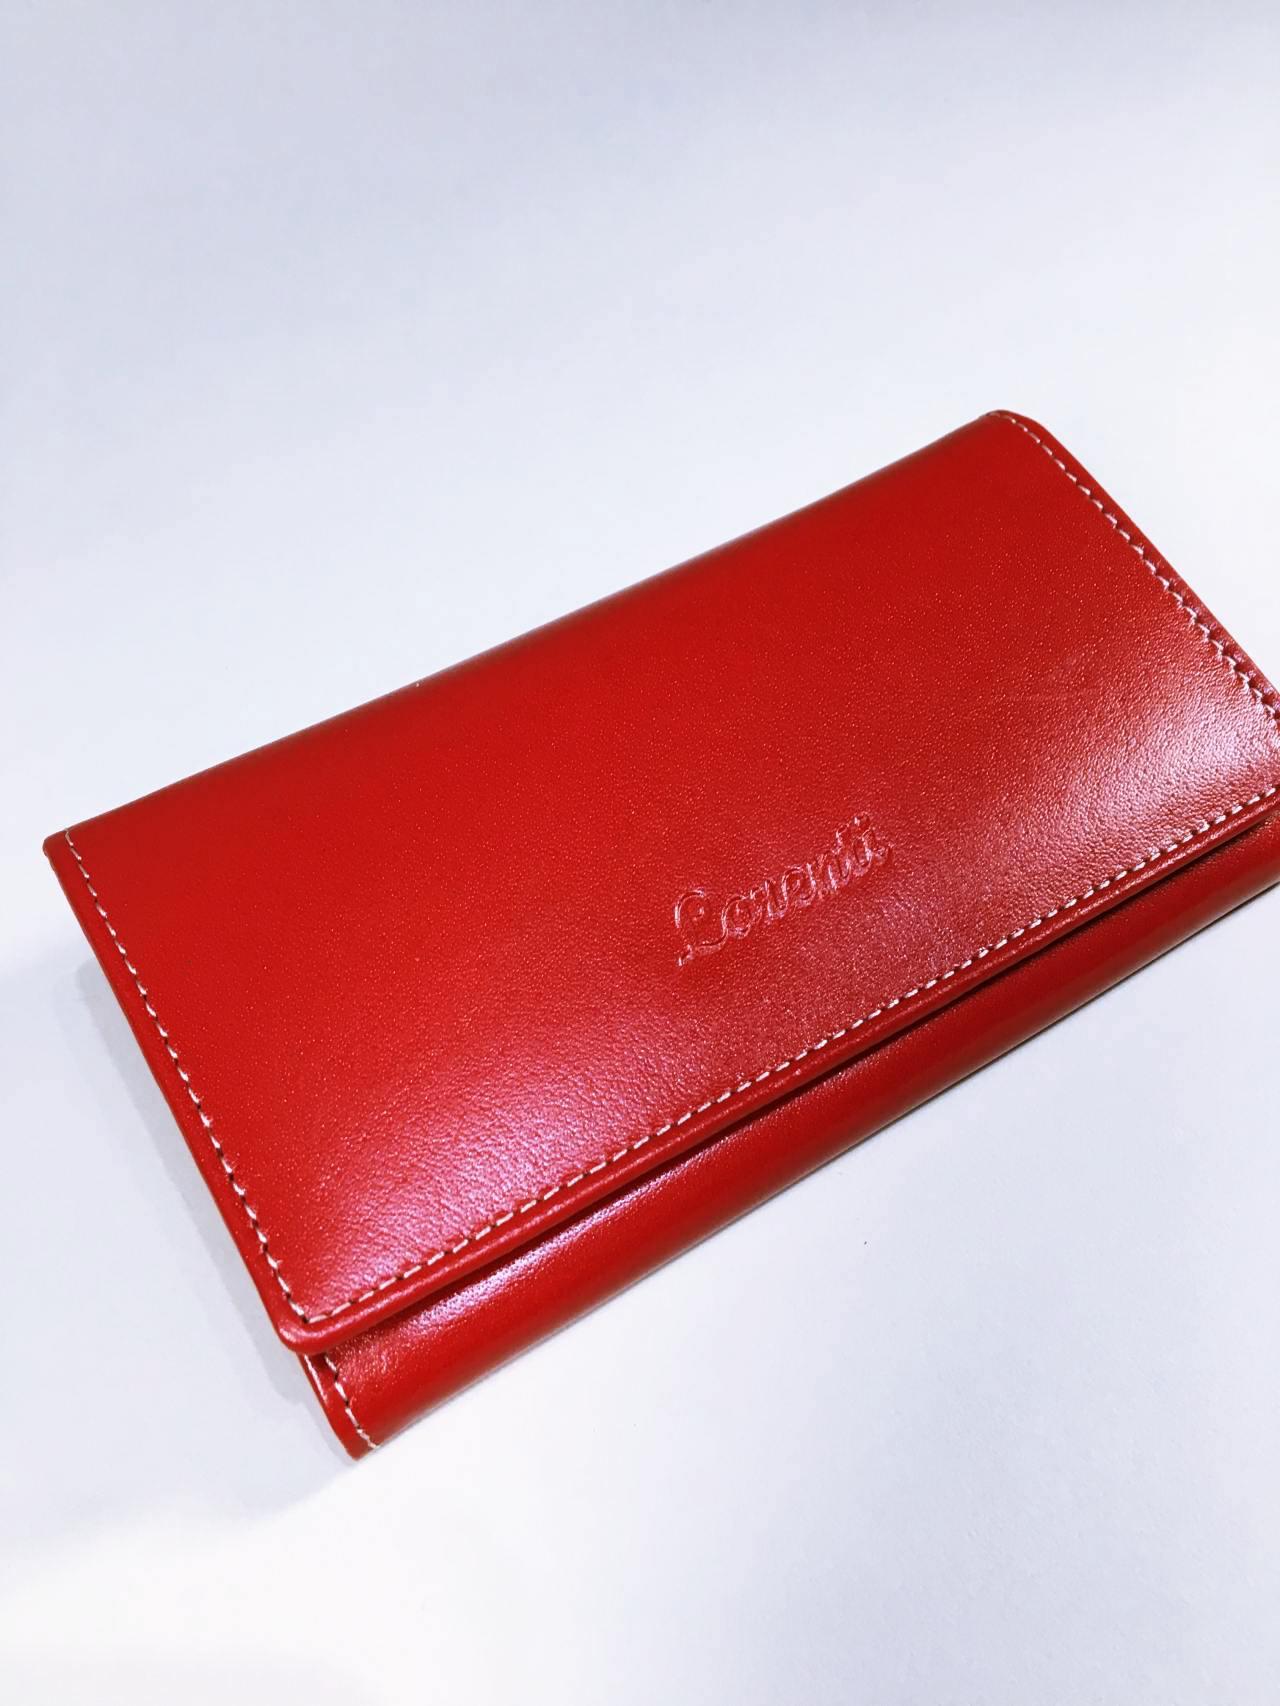 Kožená peněženka Lorenti N červená 02